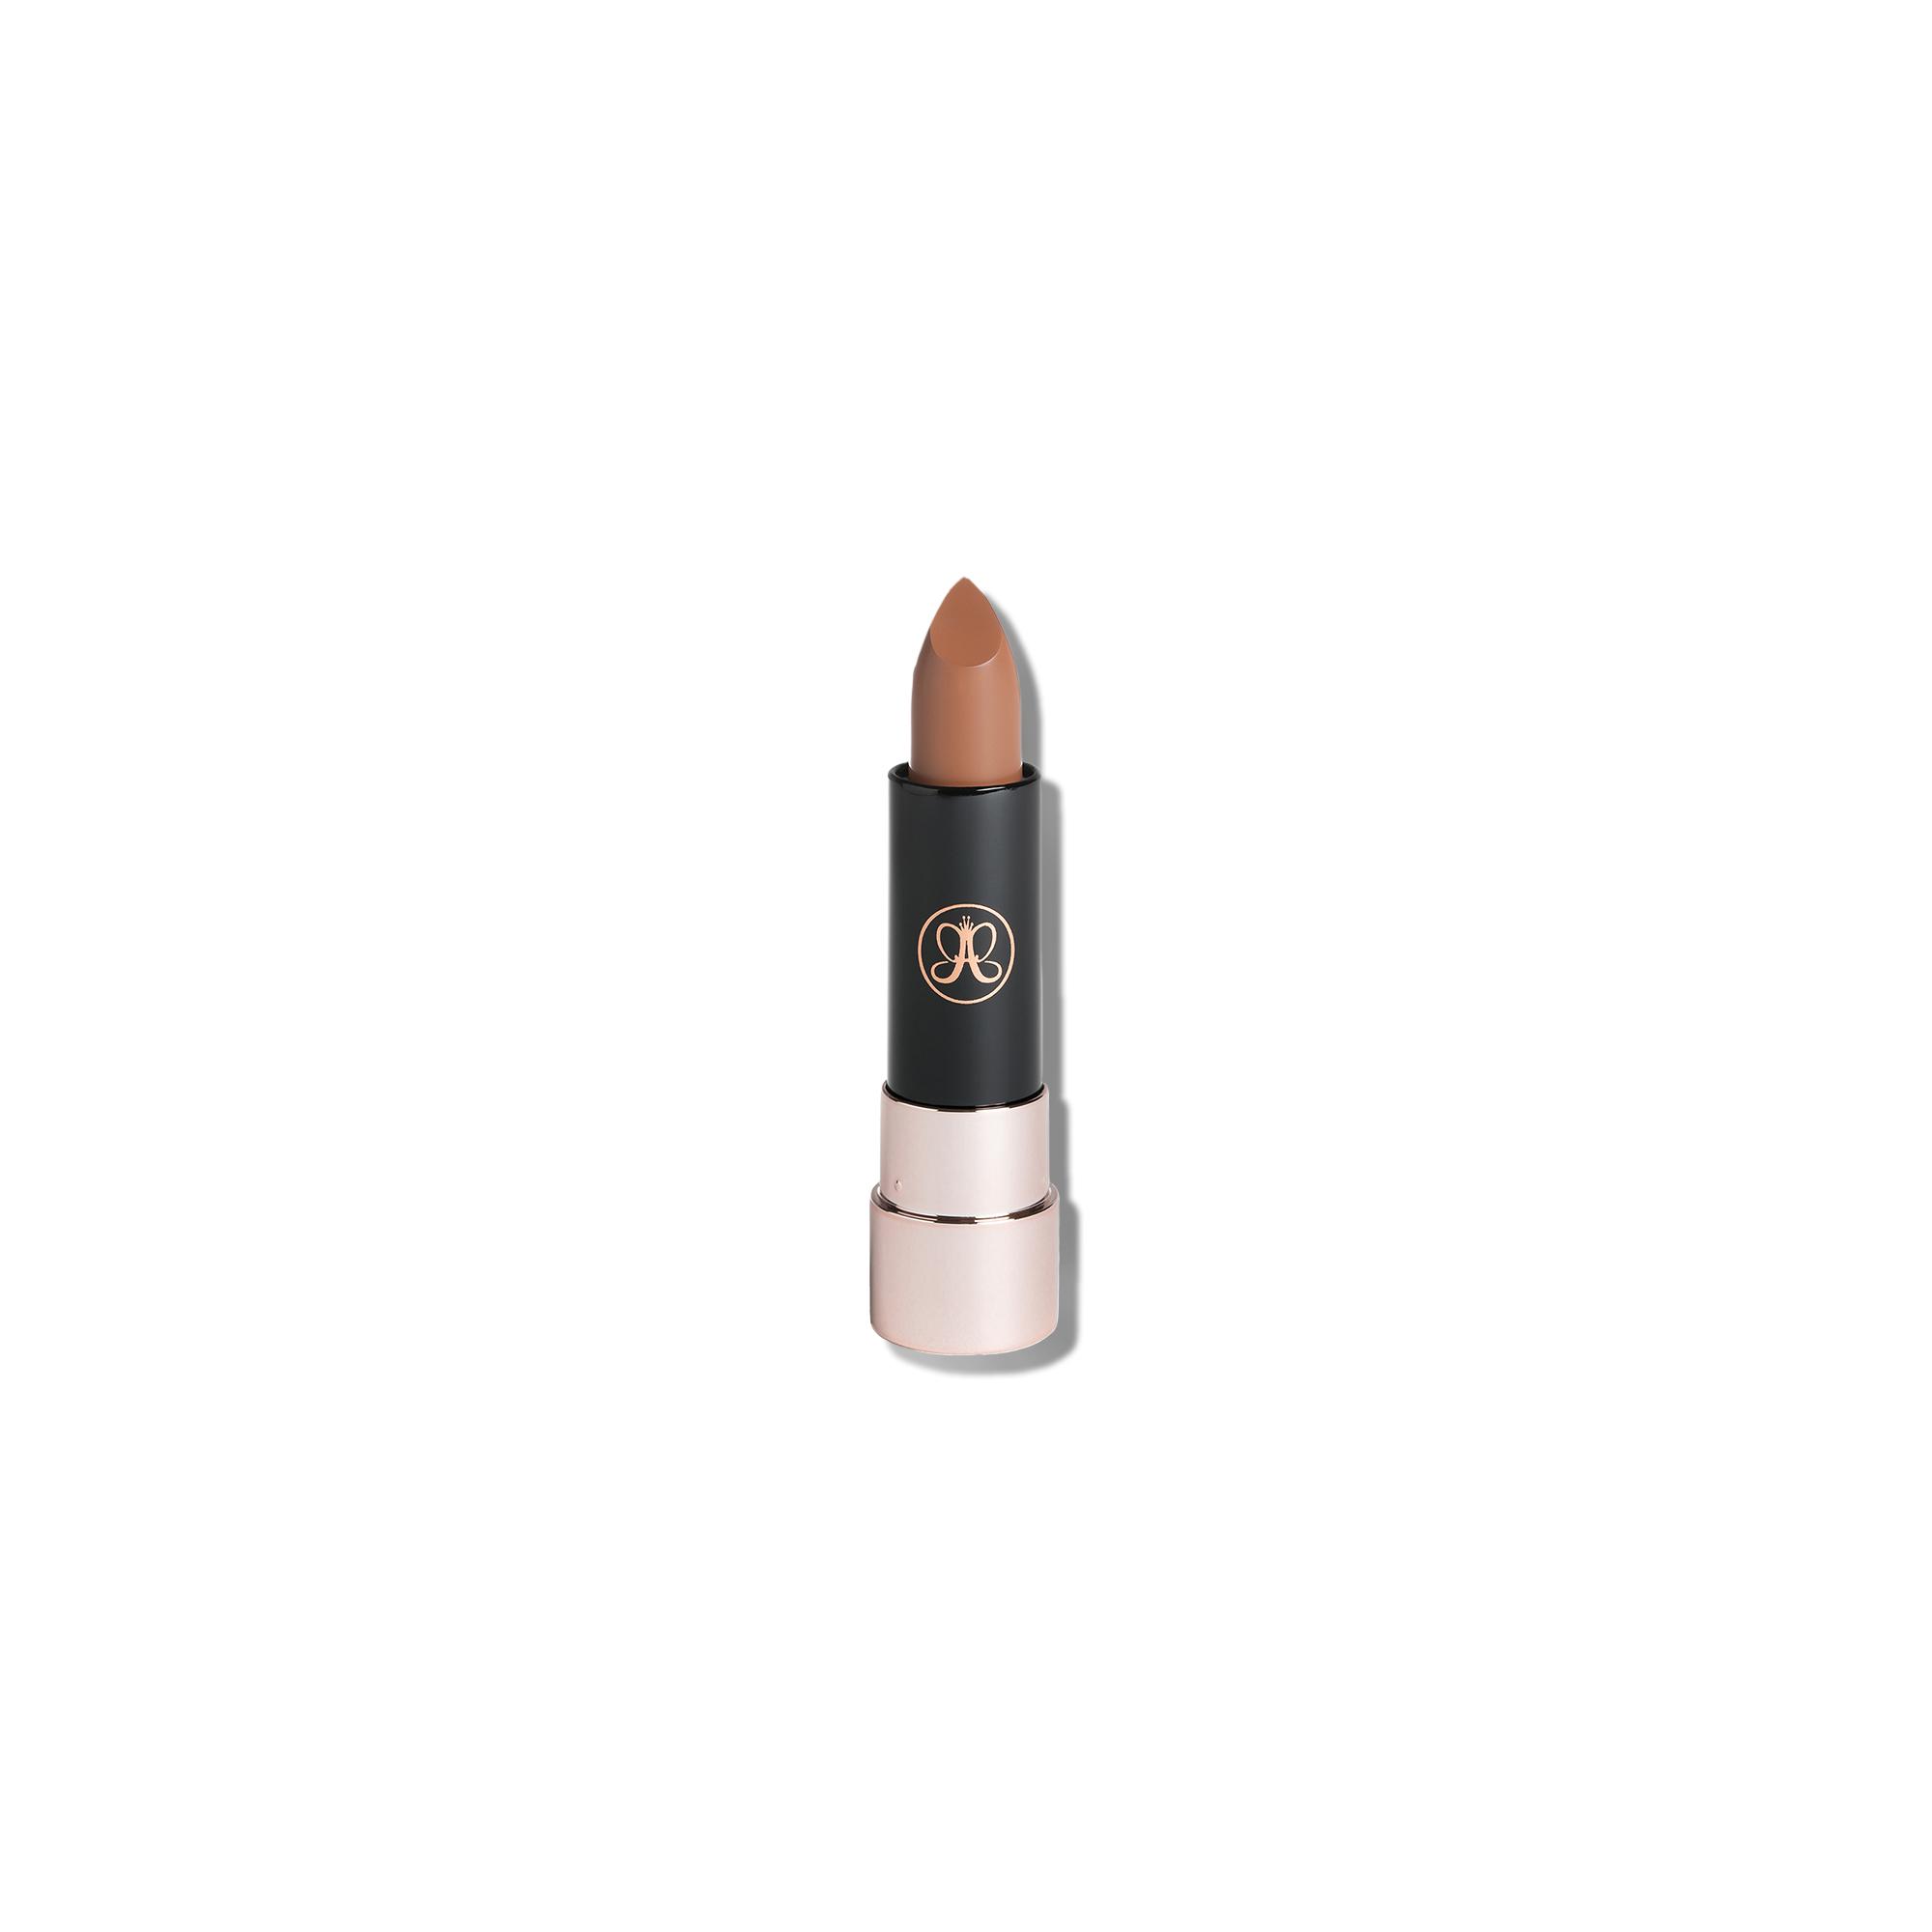 bb7654eb2 Matte Lipstick - Nude - Anastasia Beverly Hills